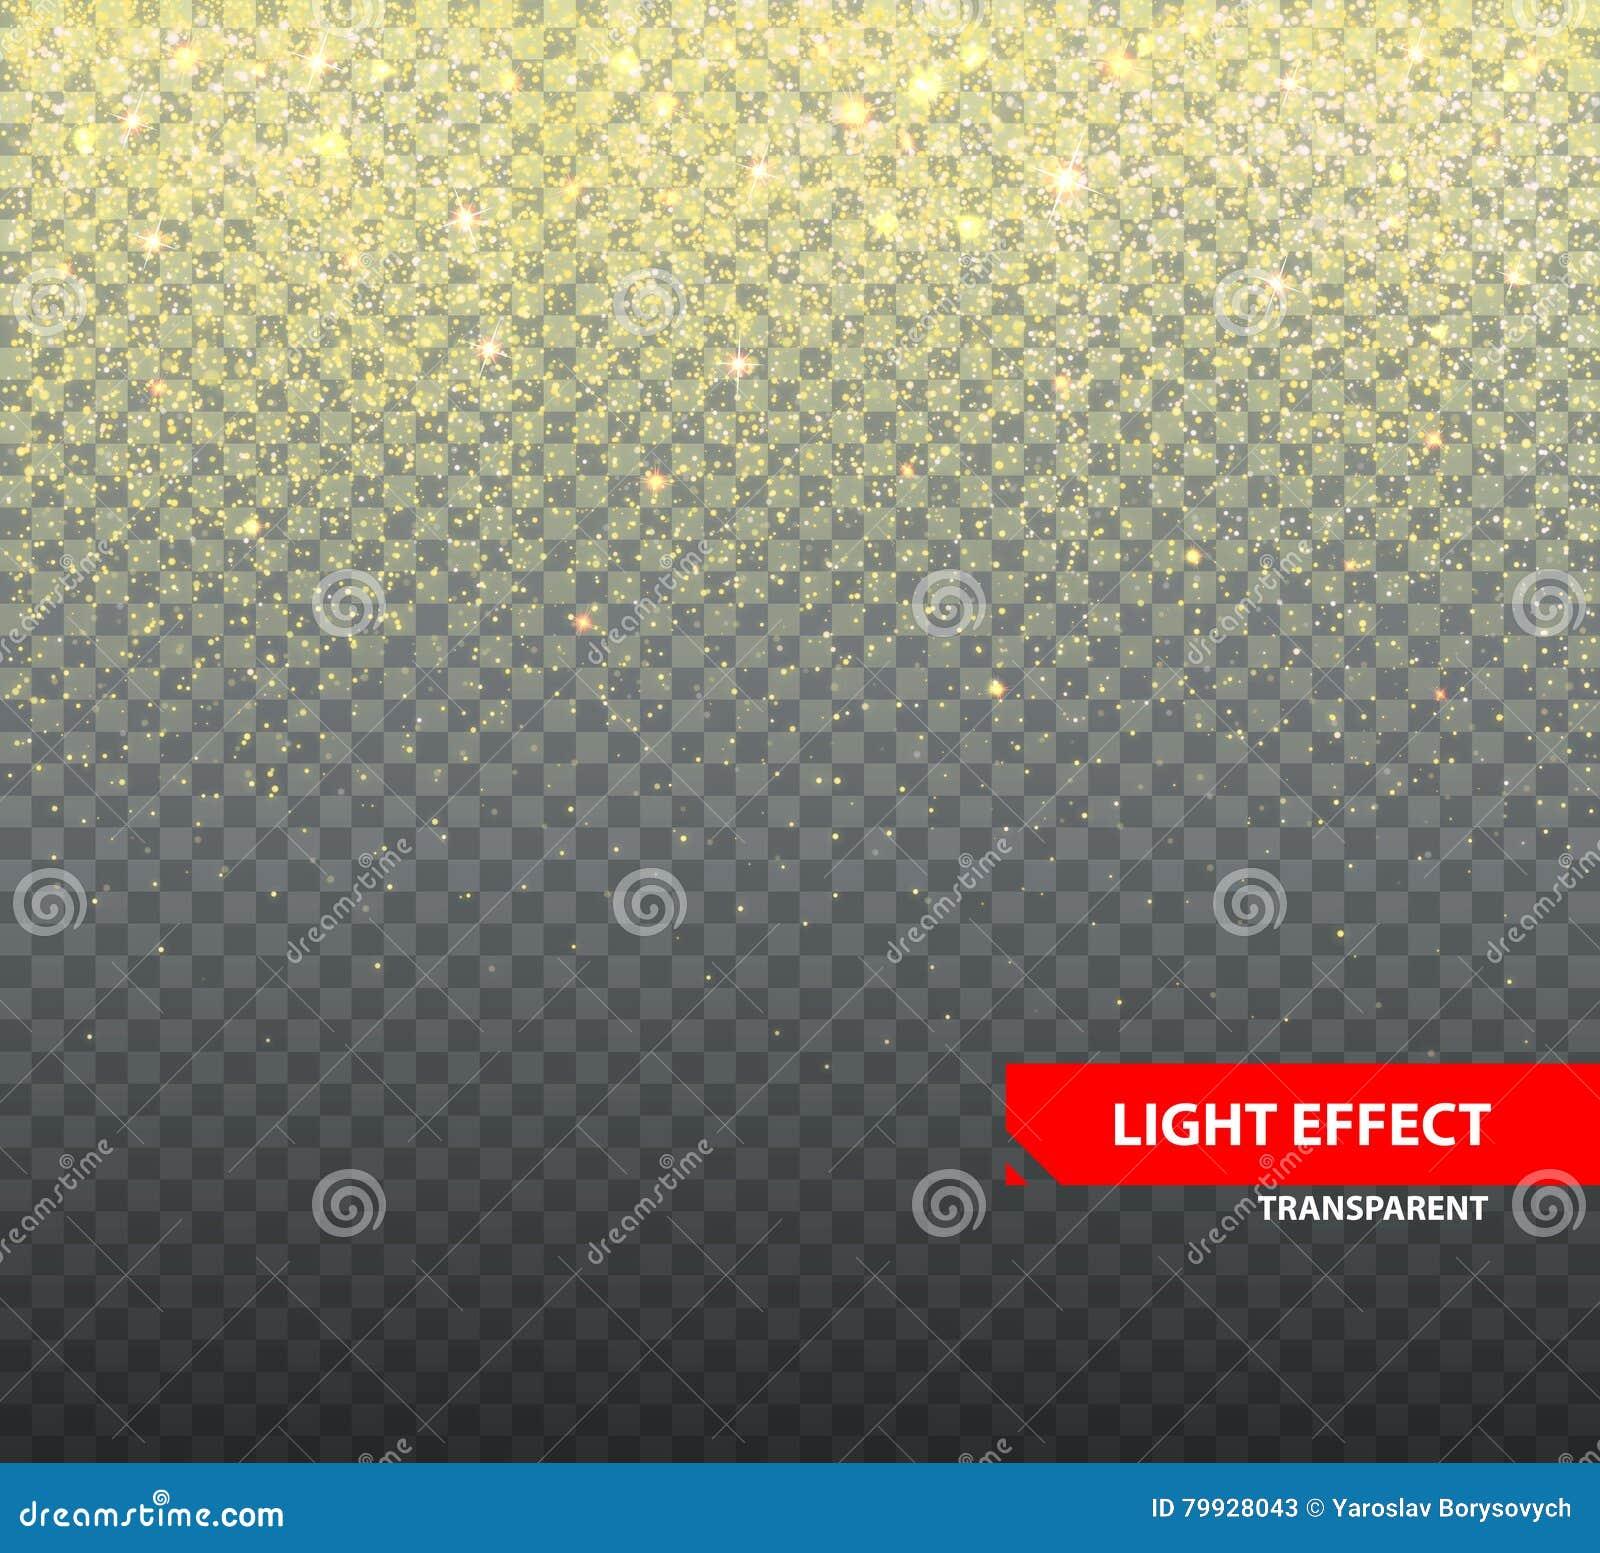 Sparkling Glitter On Transparent Background For Greeting Cards